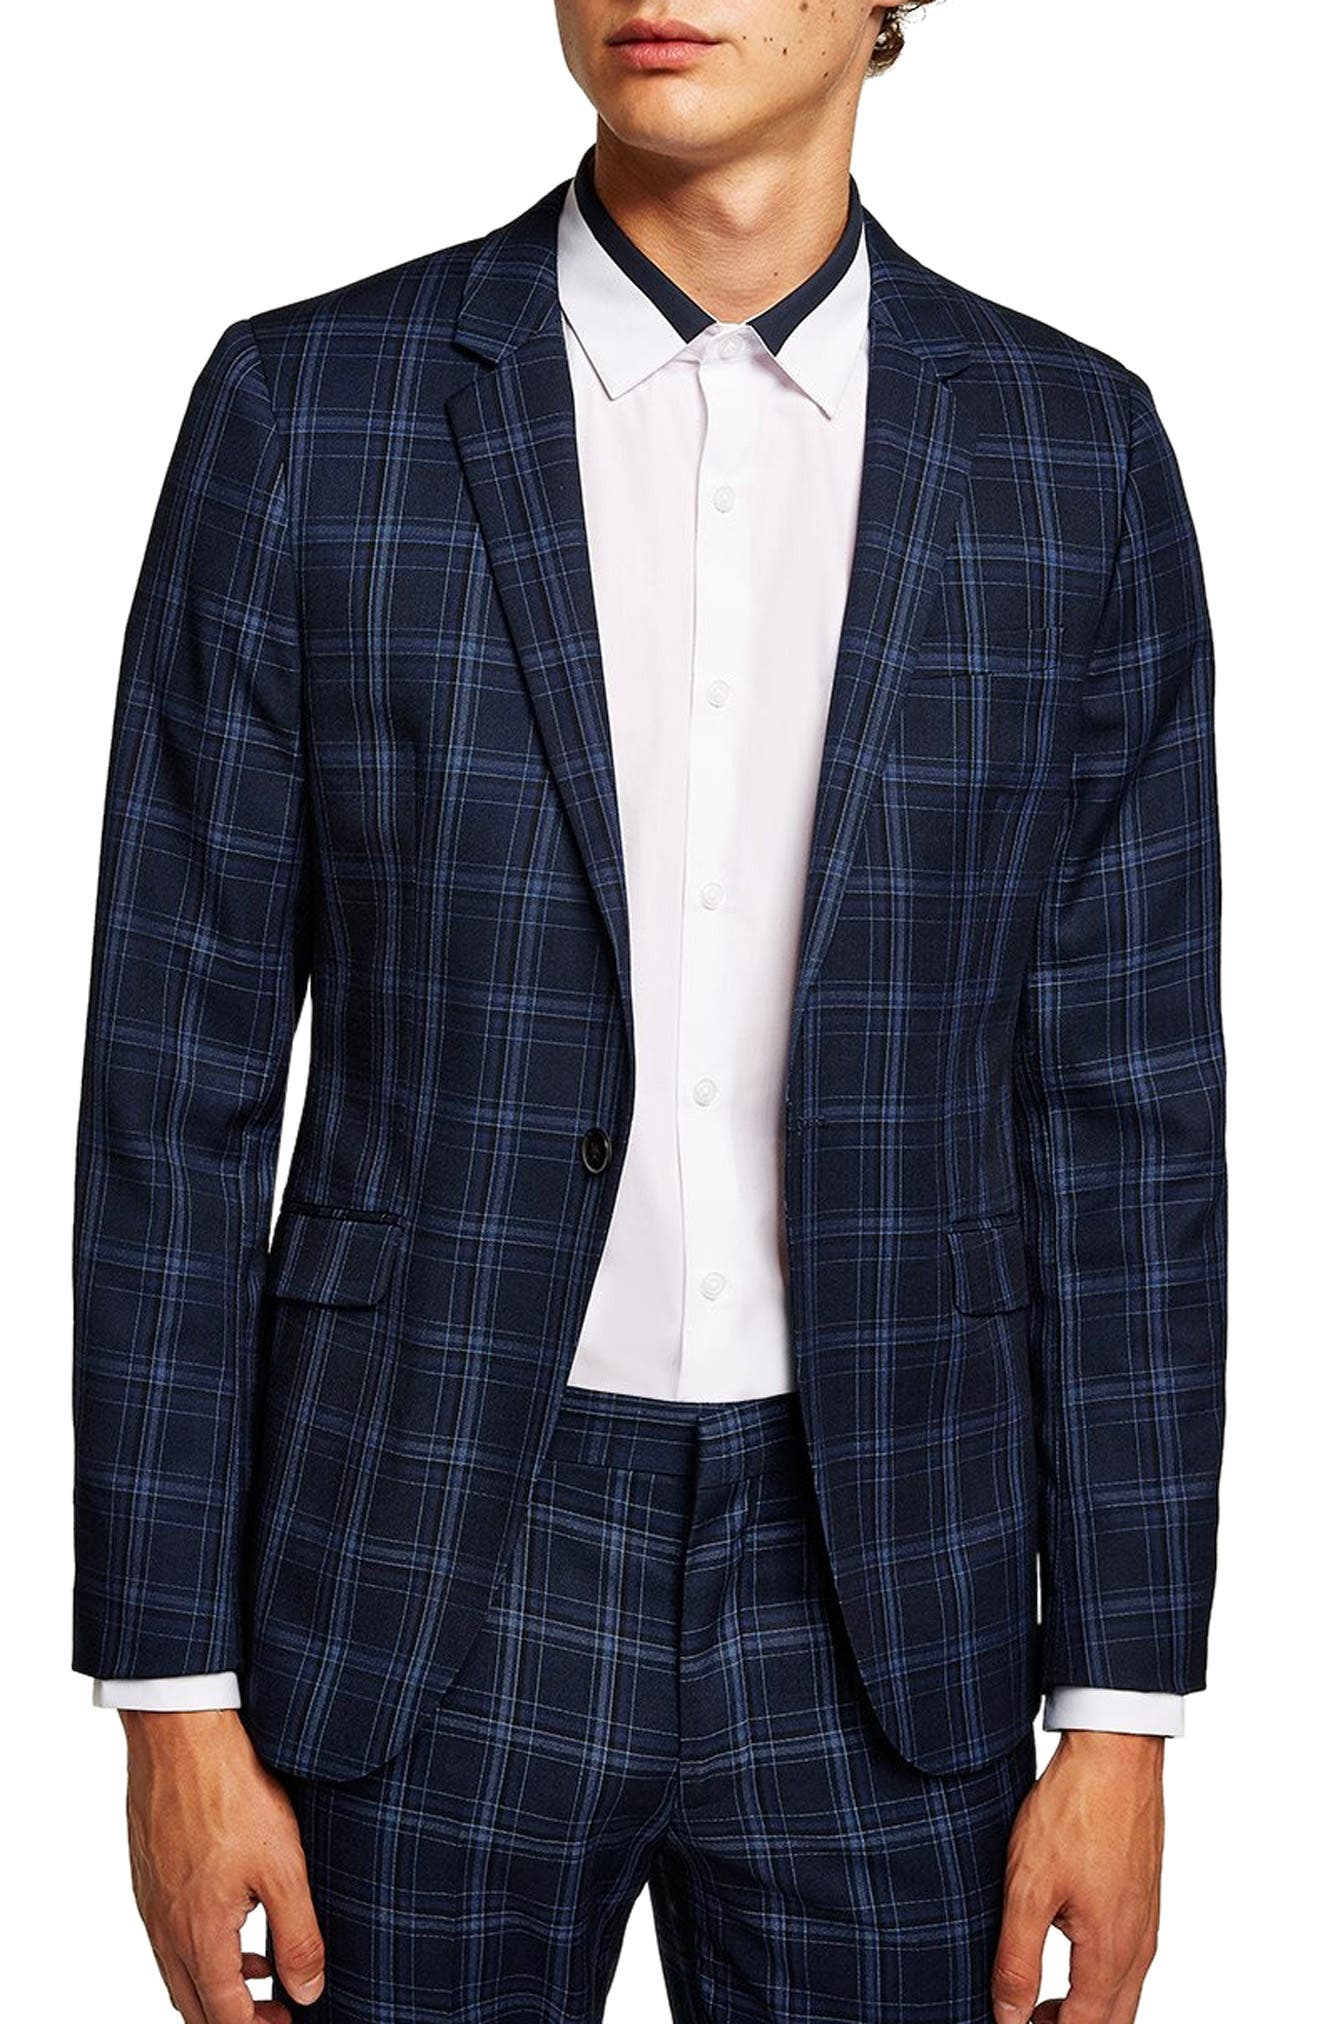 TOPMAN Skinny Fit Check Suit Jacket, Main, color, 400